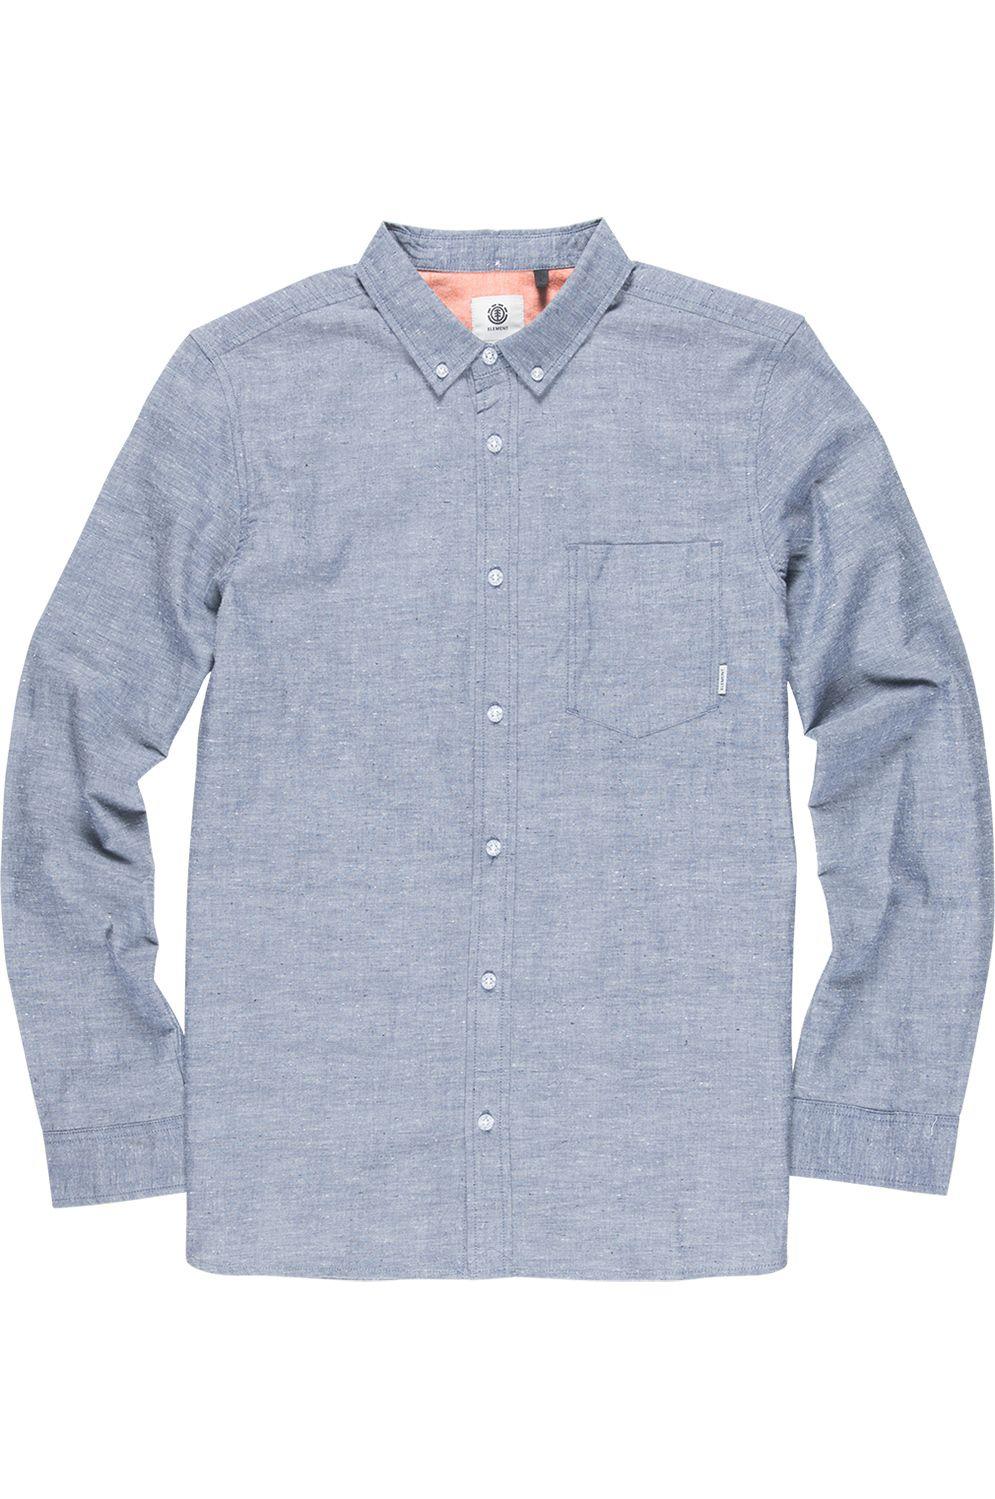 Camisa Element GREENE NEPS LS FOUNDATION Navy